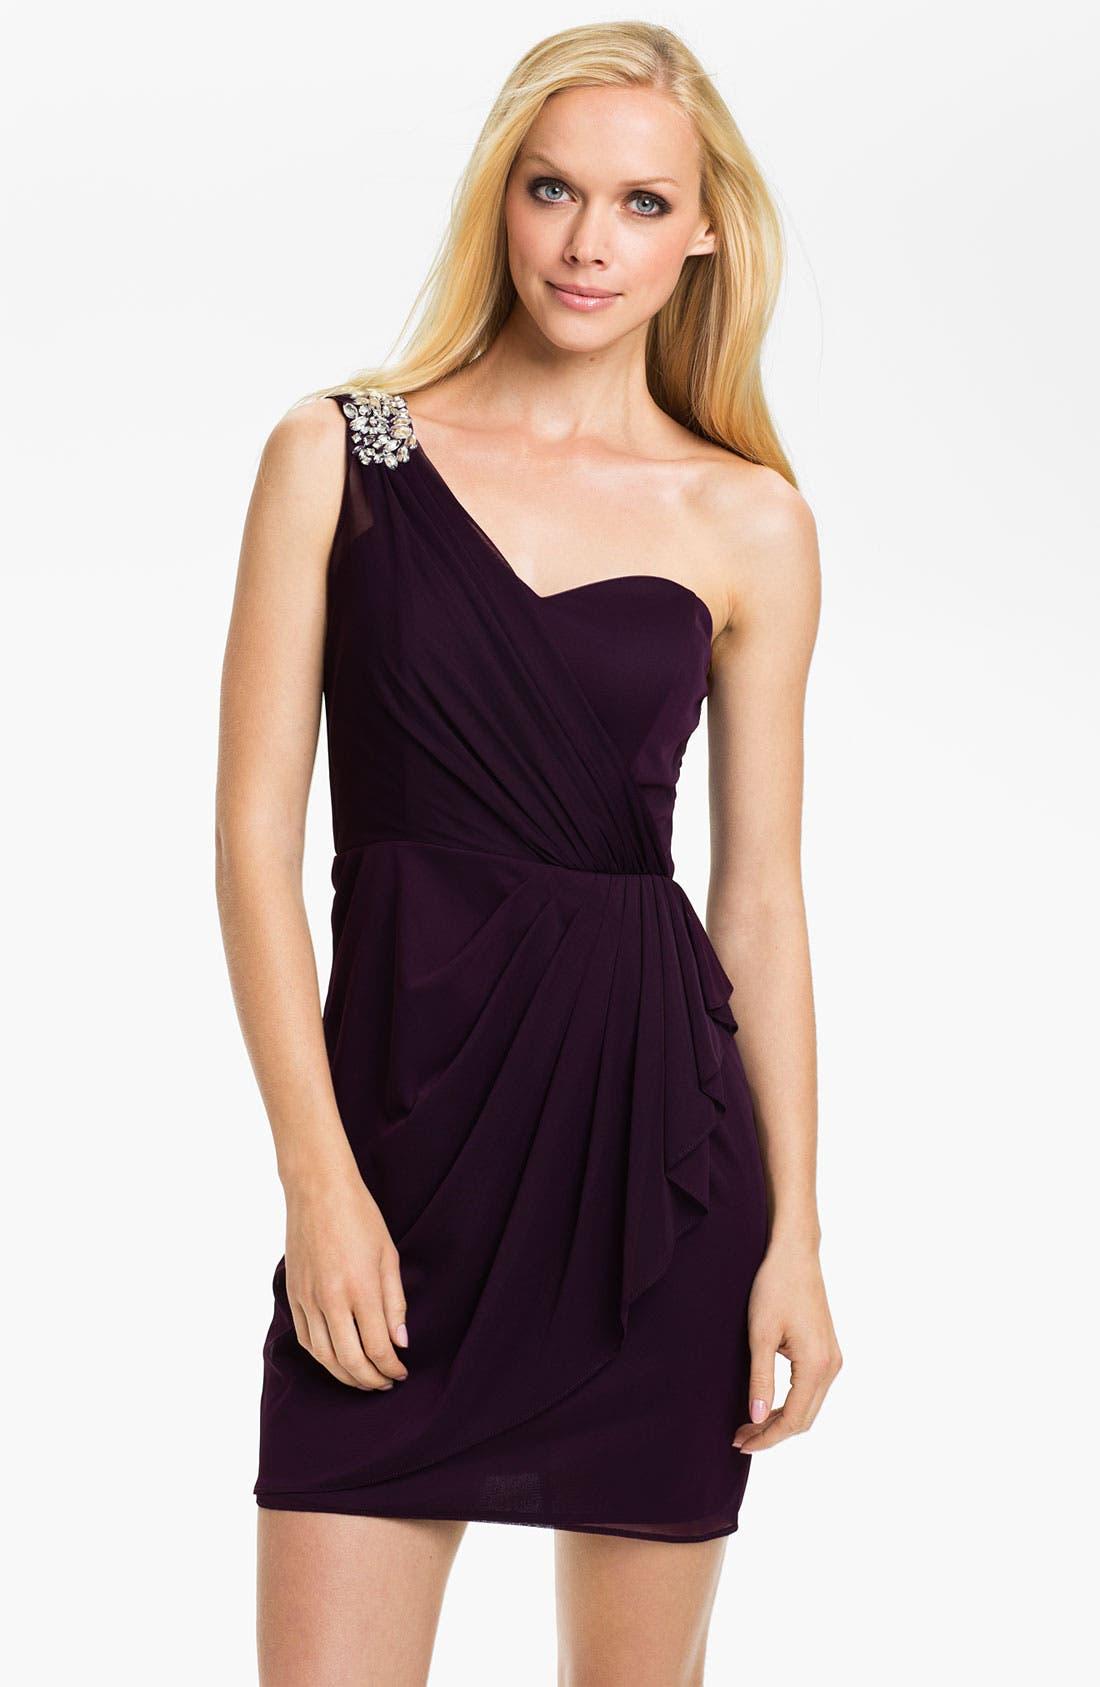 Alternate Image 1 Selected - Xscape Pleated One Shoulder Mesh Dress (Petite)